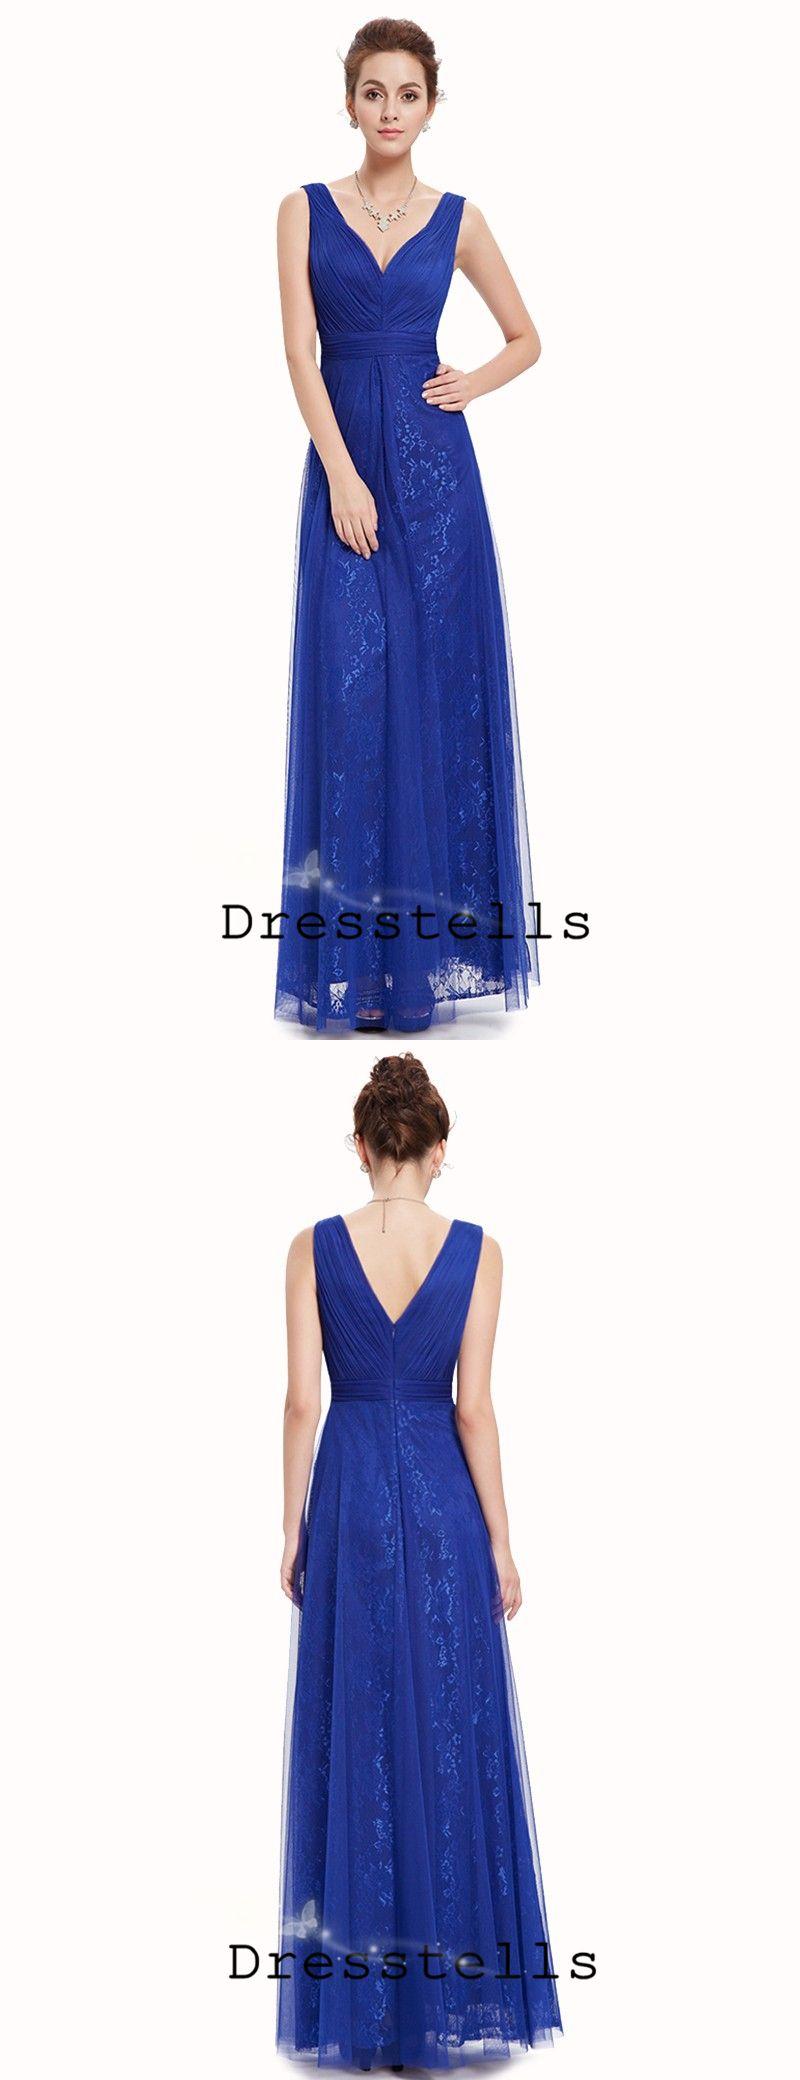 Royal blue aline vneck floorlength bridesmaid prom dress with